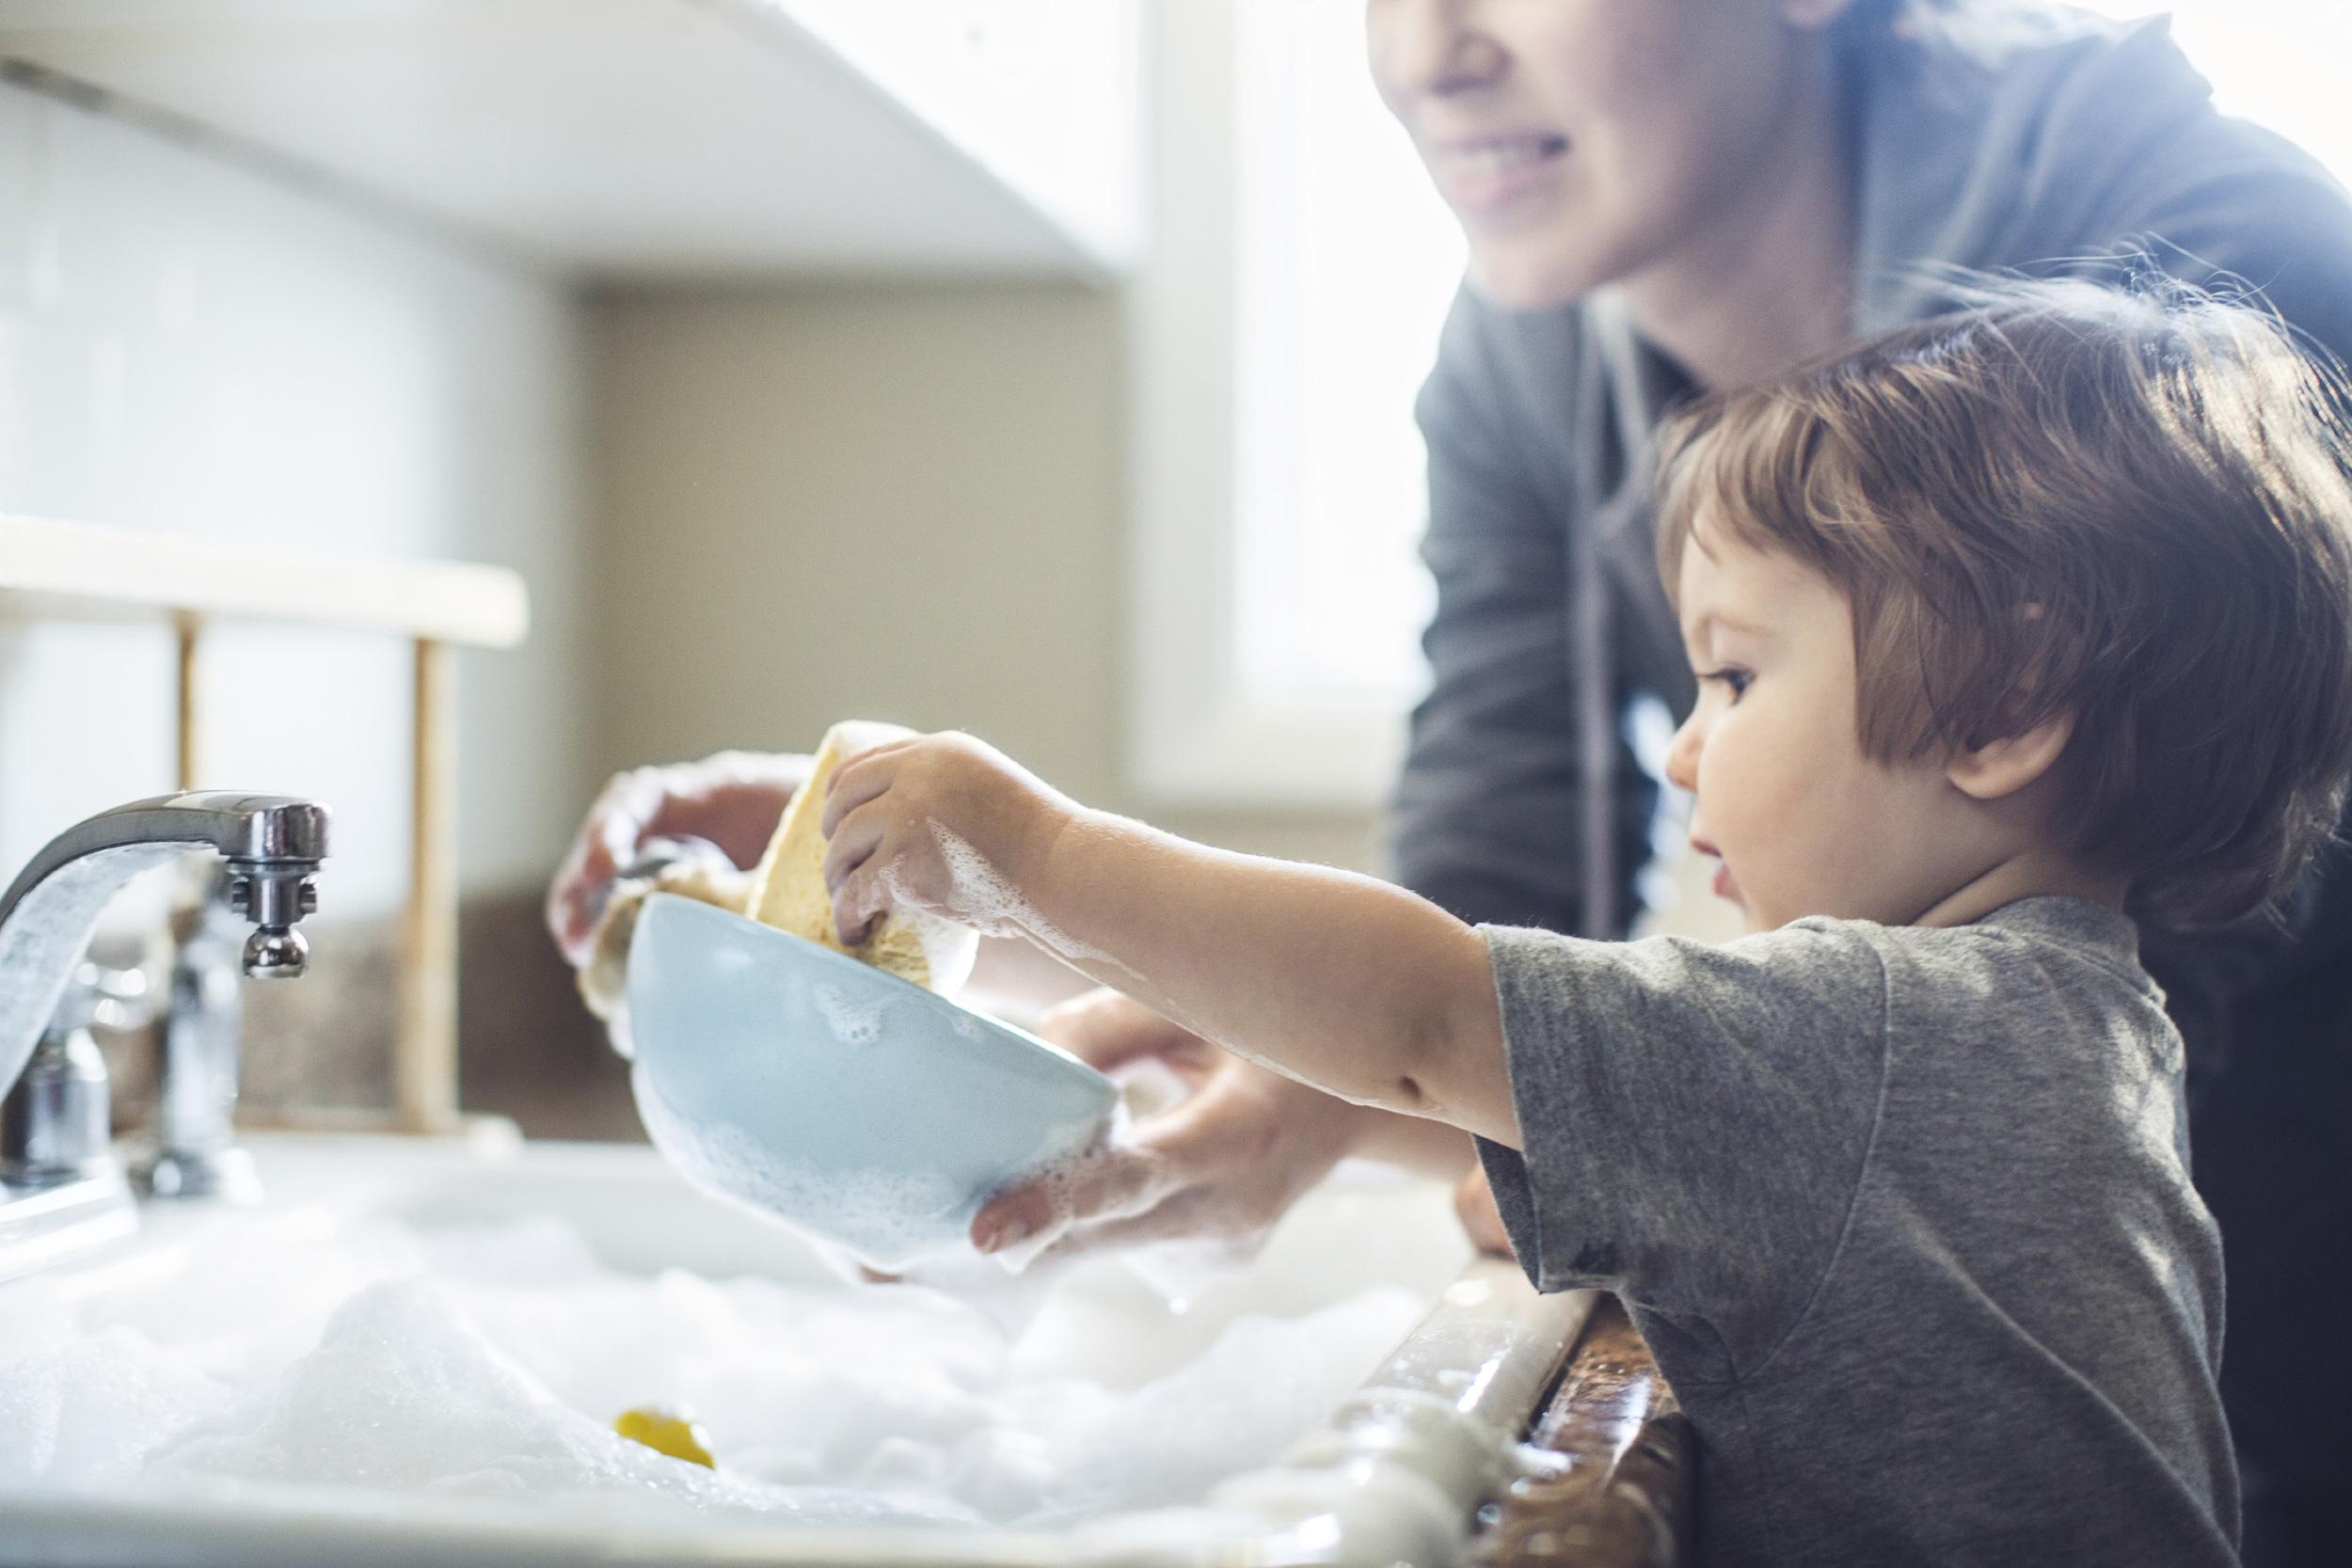 stock-photo-22719125-baby-dish-washing-cropped.jpg